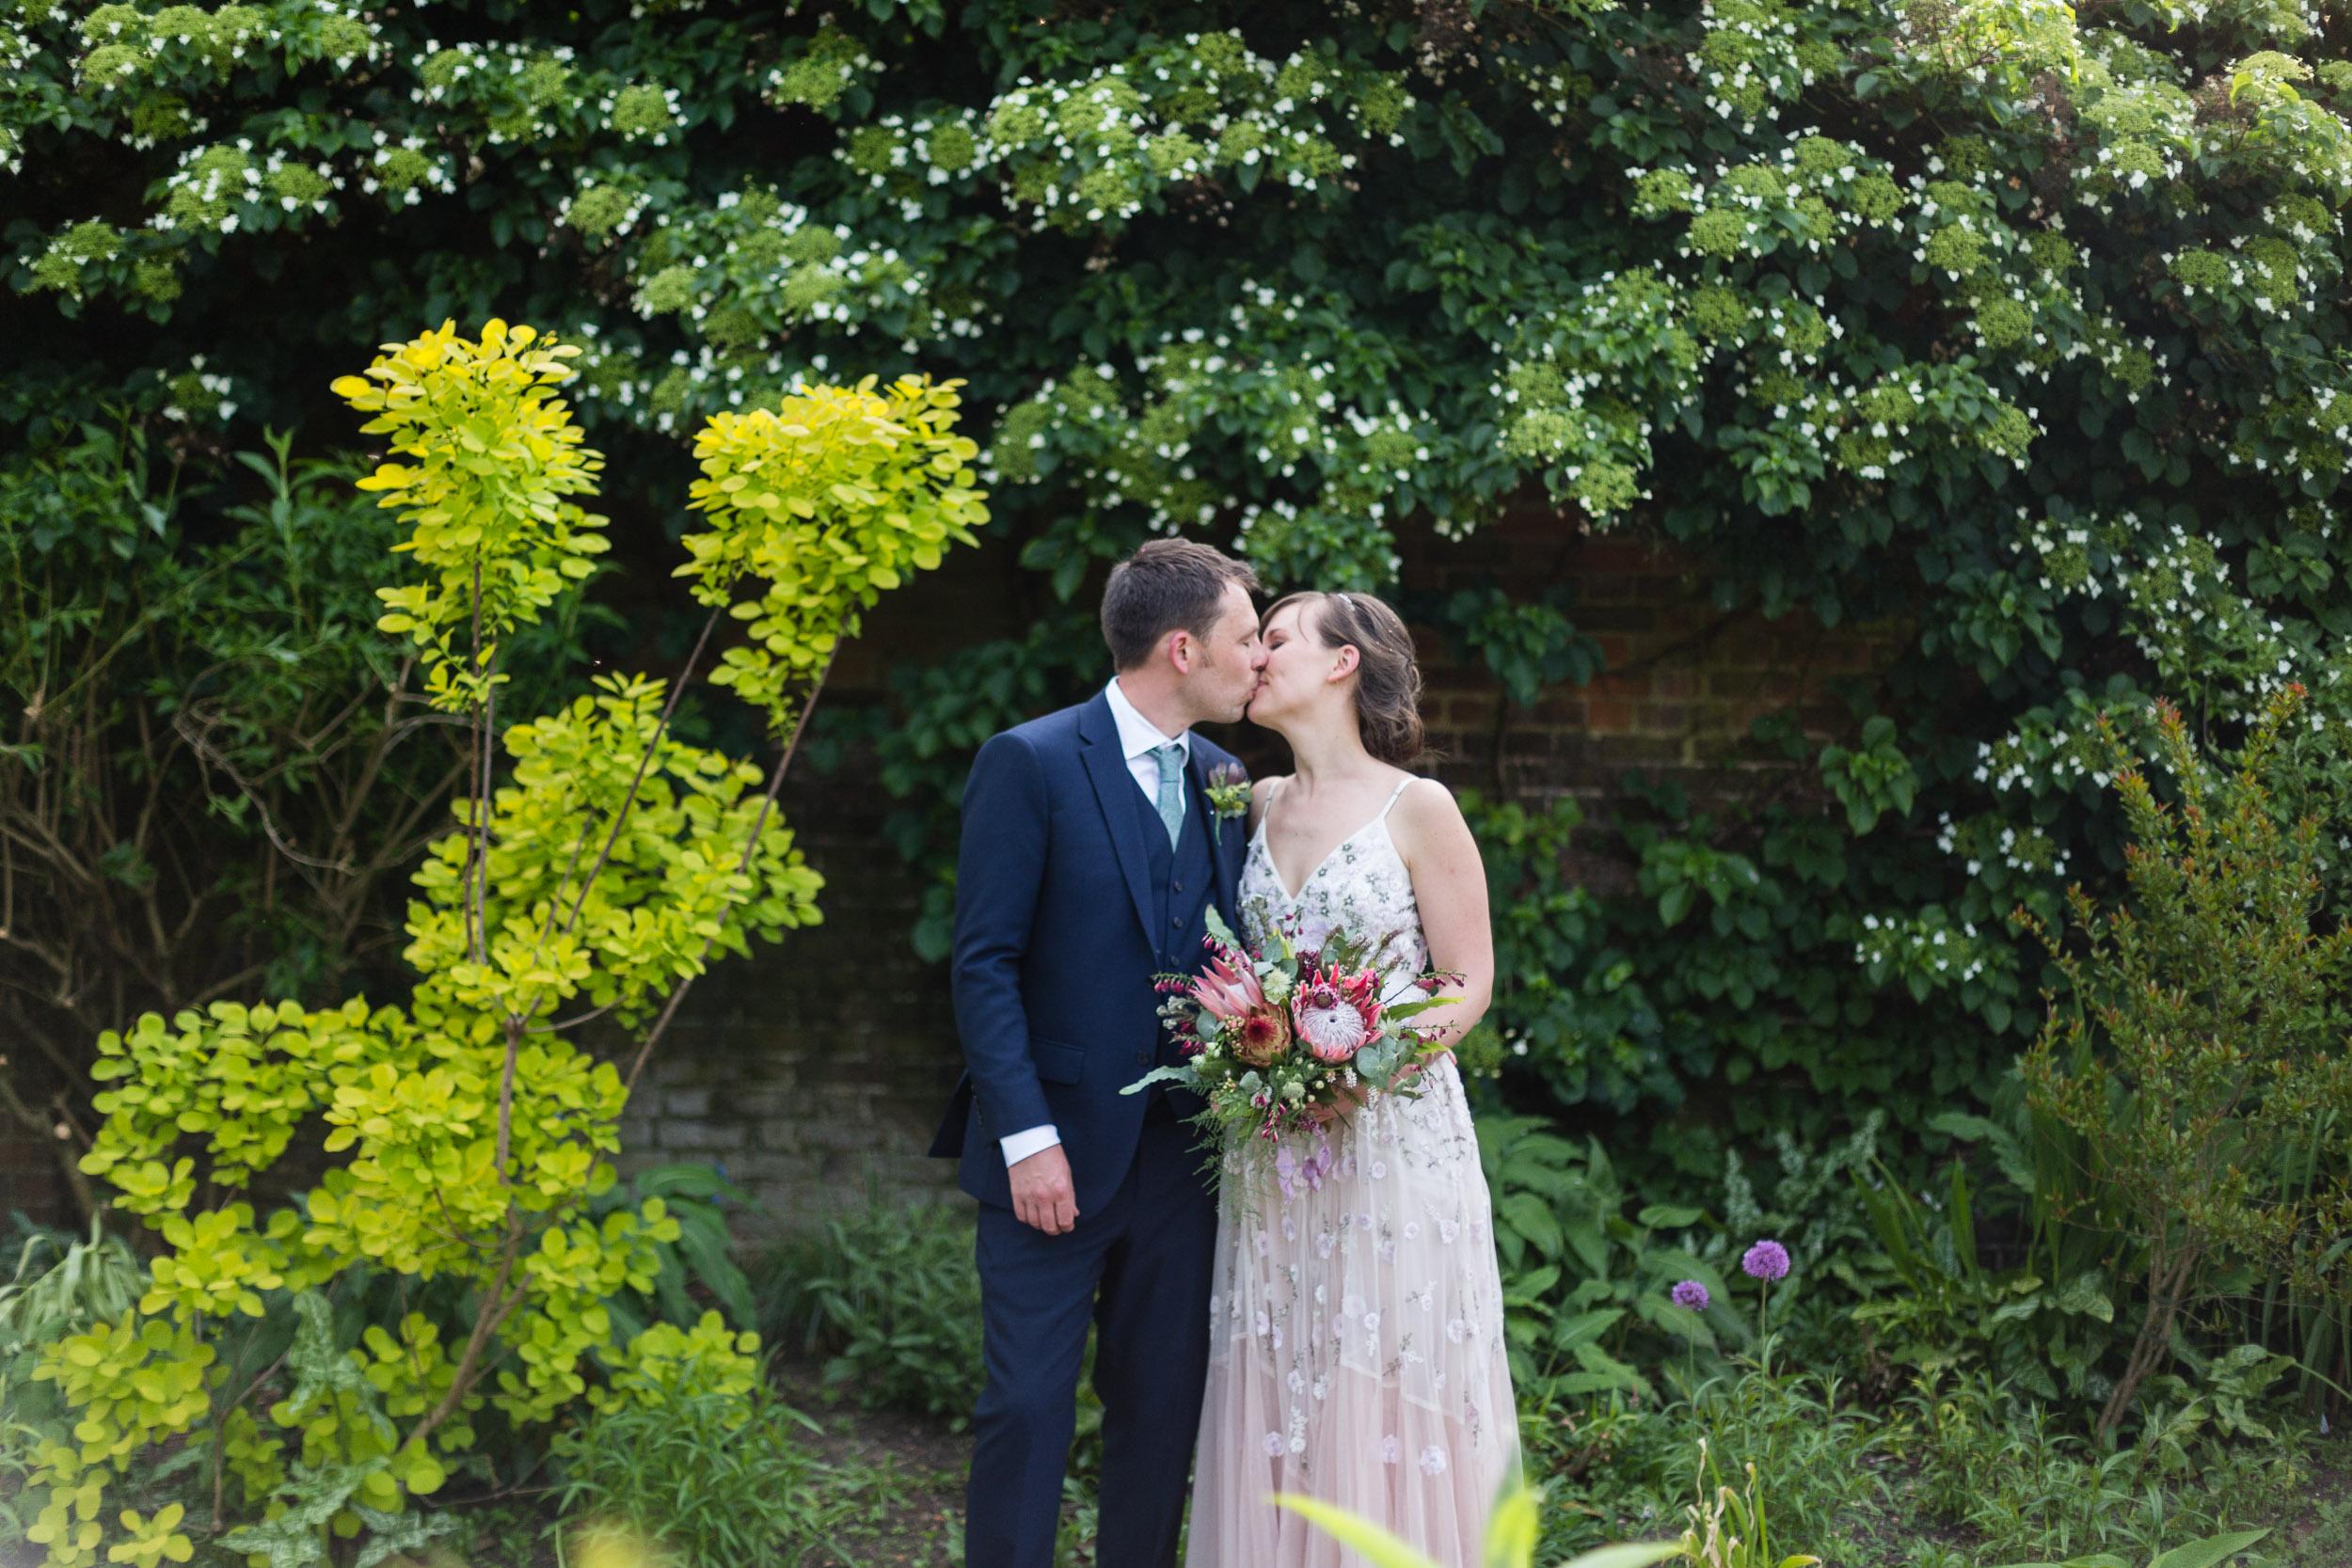 brockwell-lido-brixton-herne-hill-wedding-282.jpg